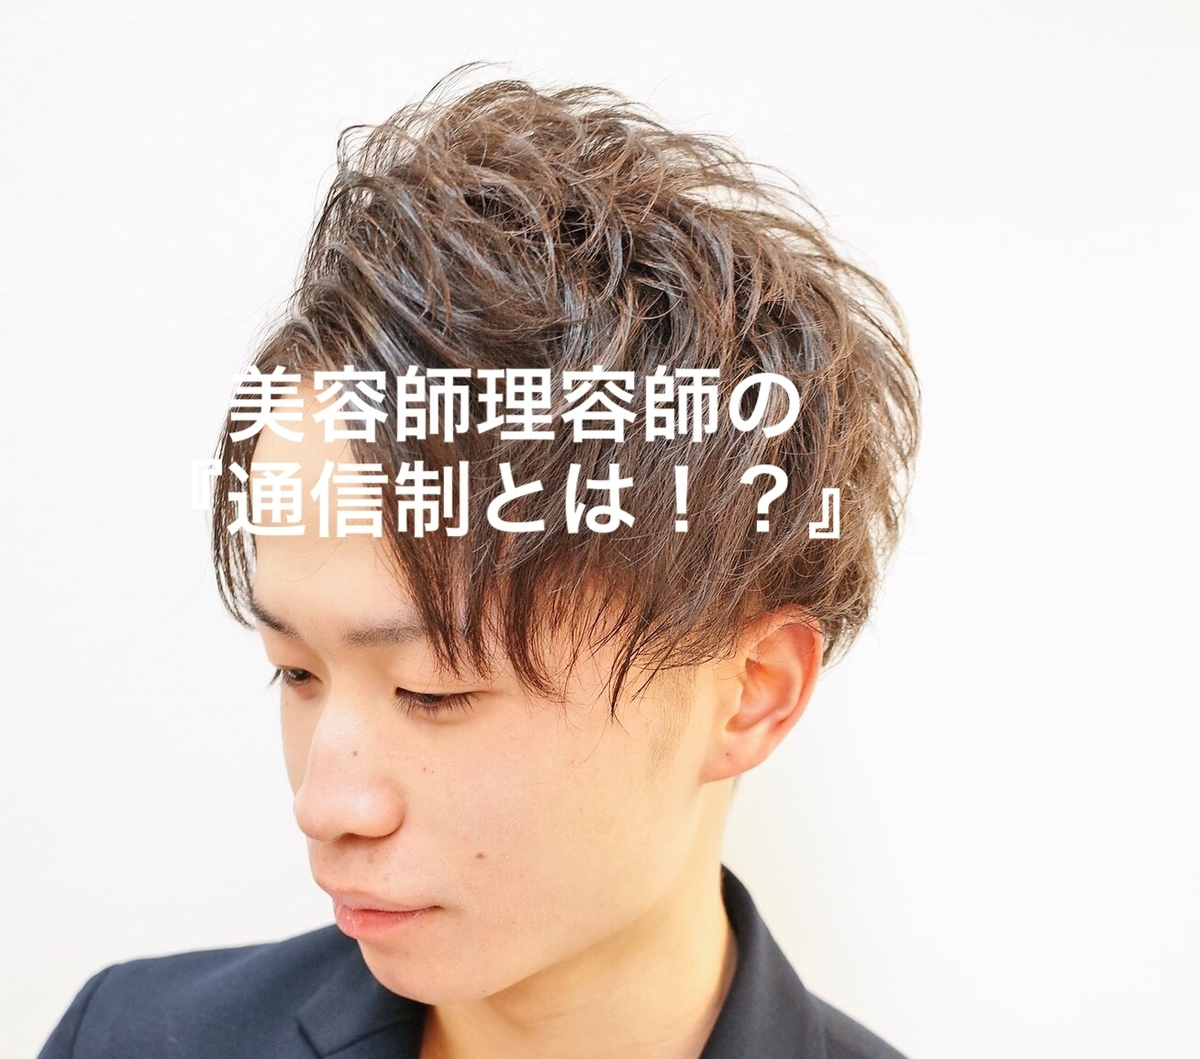 f:id:menzusettoribiyousi:20190321235600j:plain